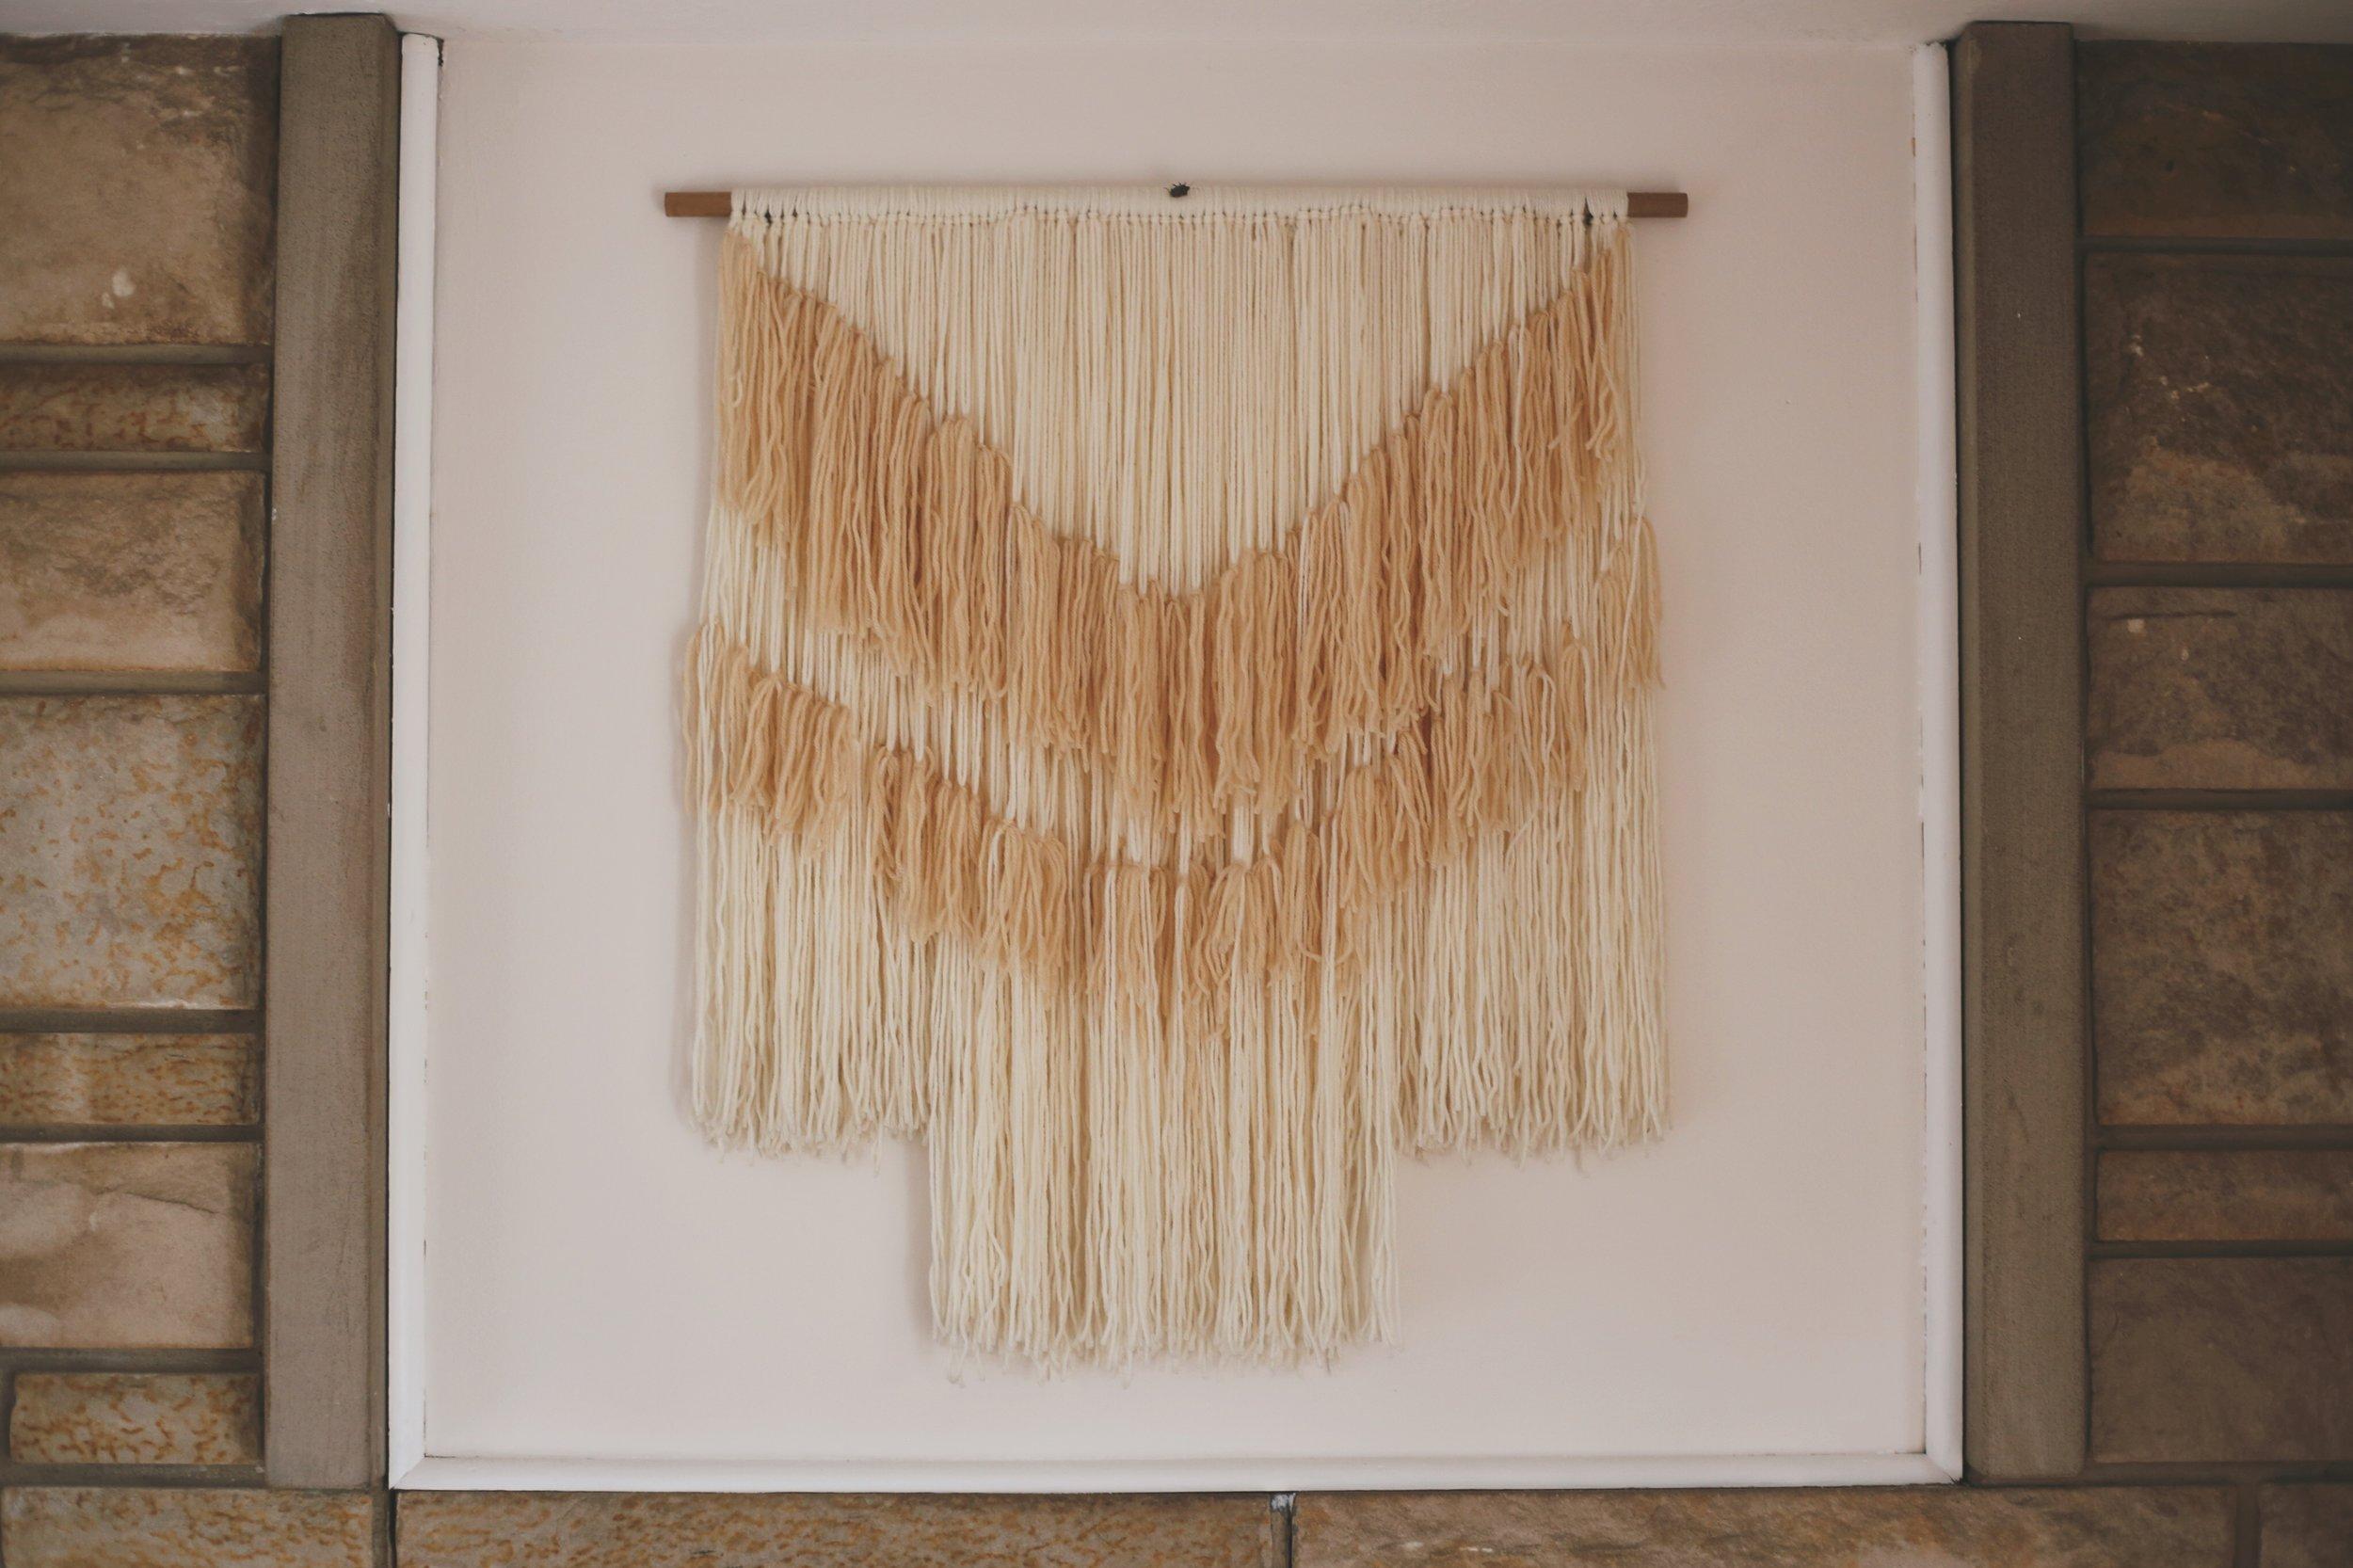 DIY easy wall hanging (no weaving involved)